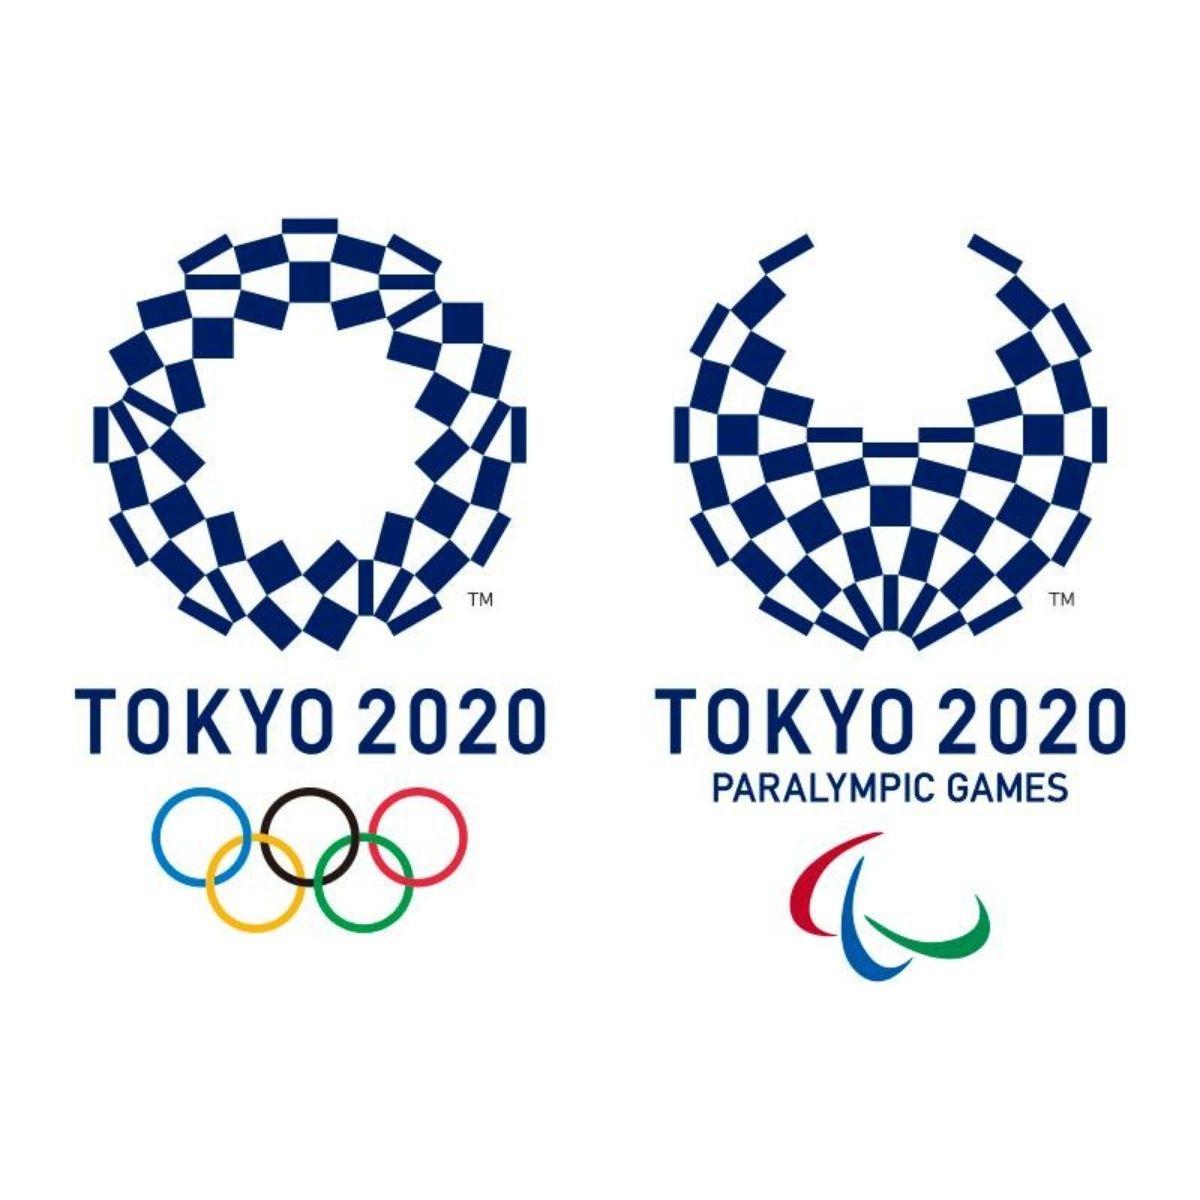 Tokyo 2020 senza la Corea